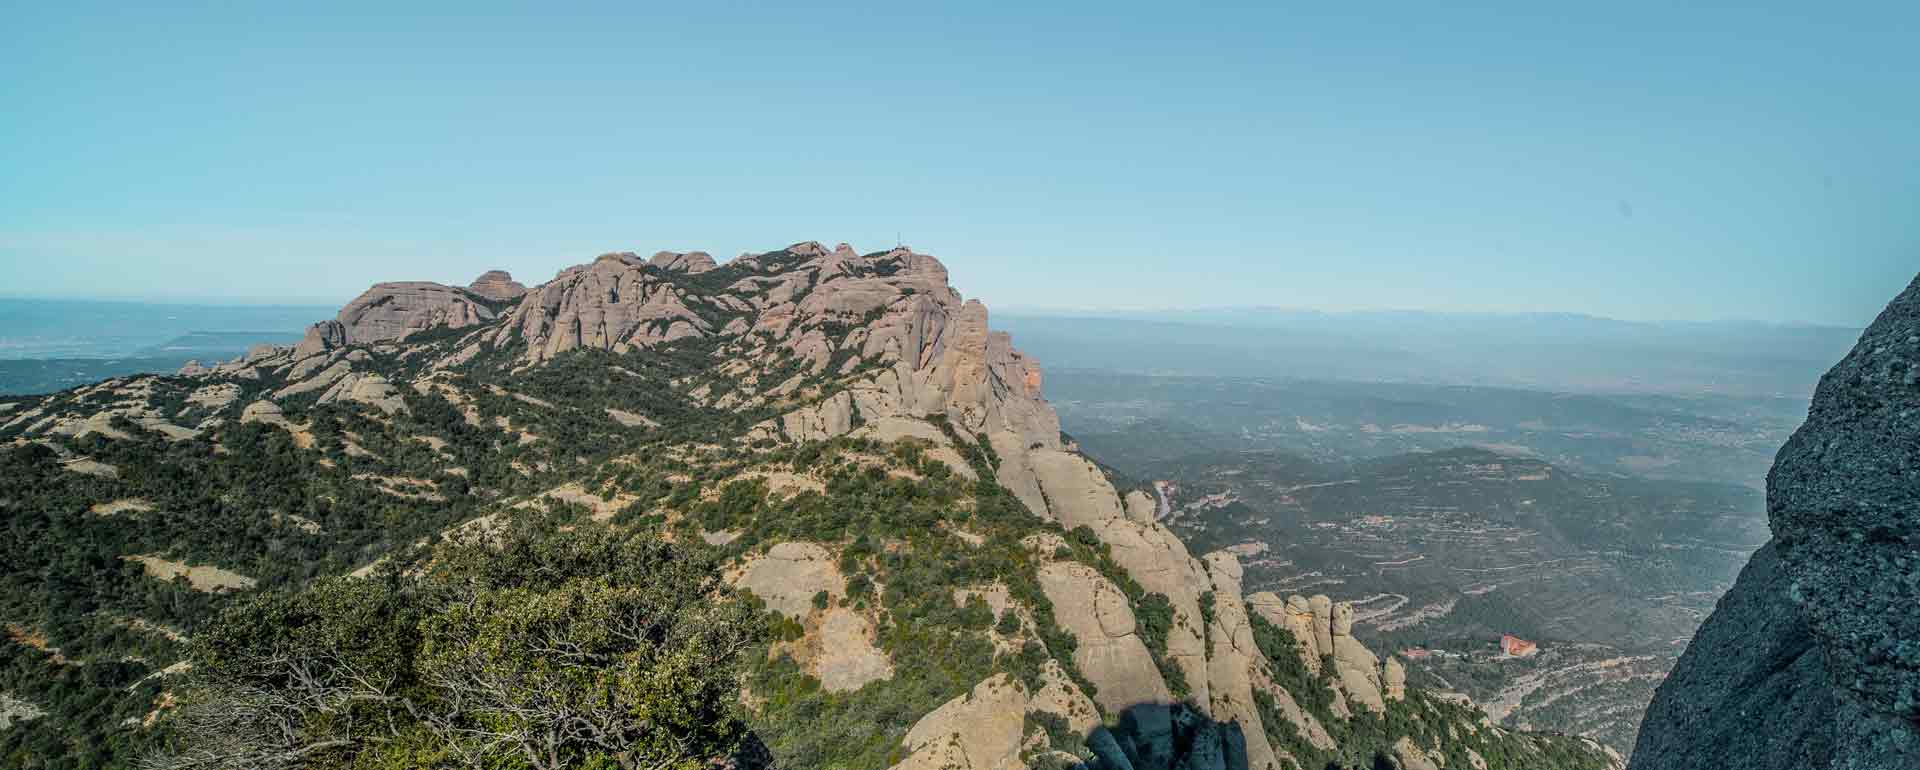 hiking-near-barcelona-montserrat-